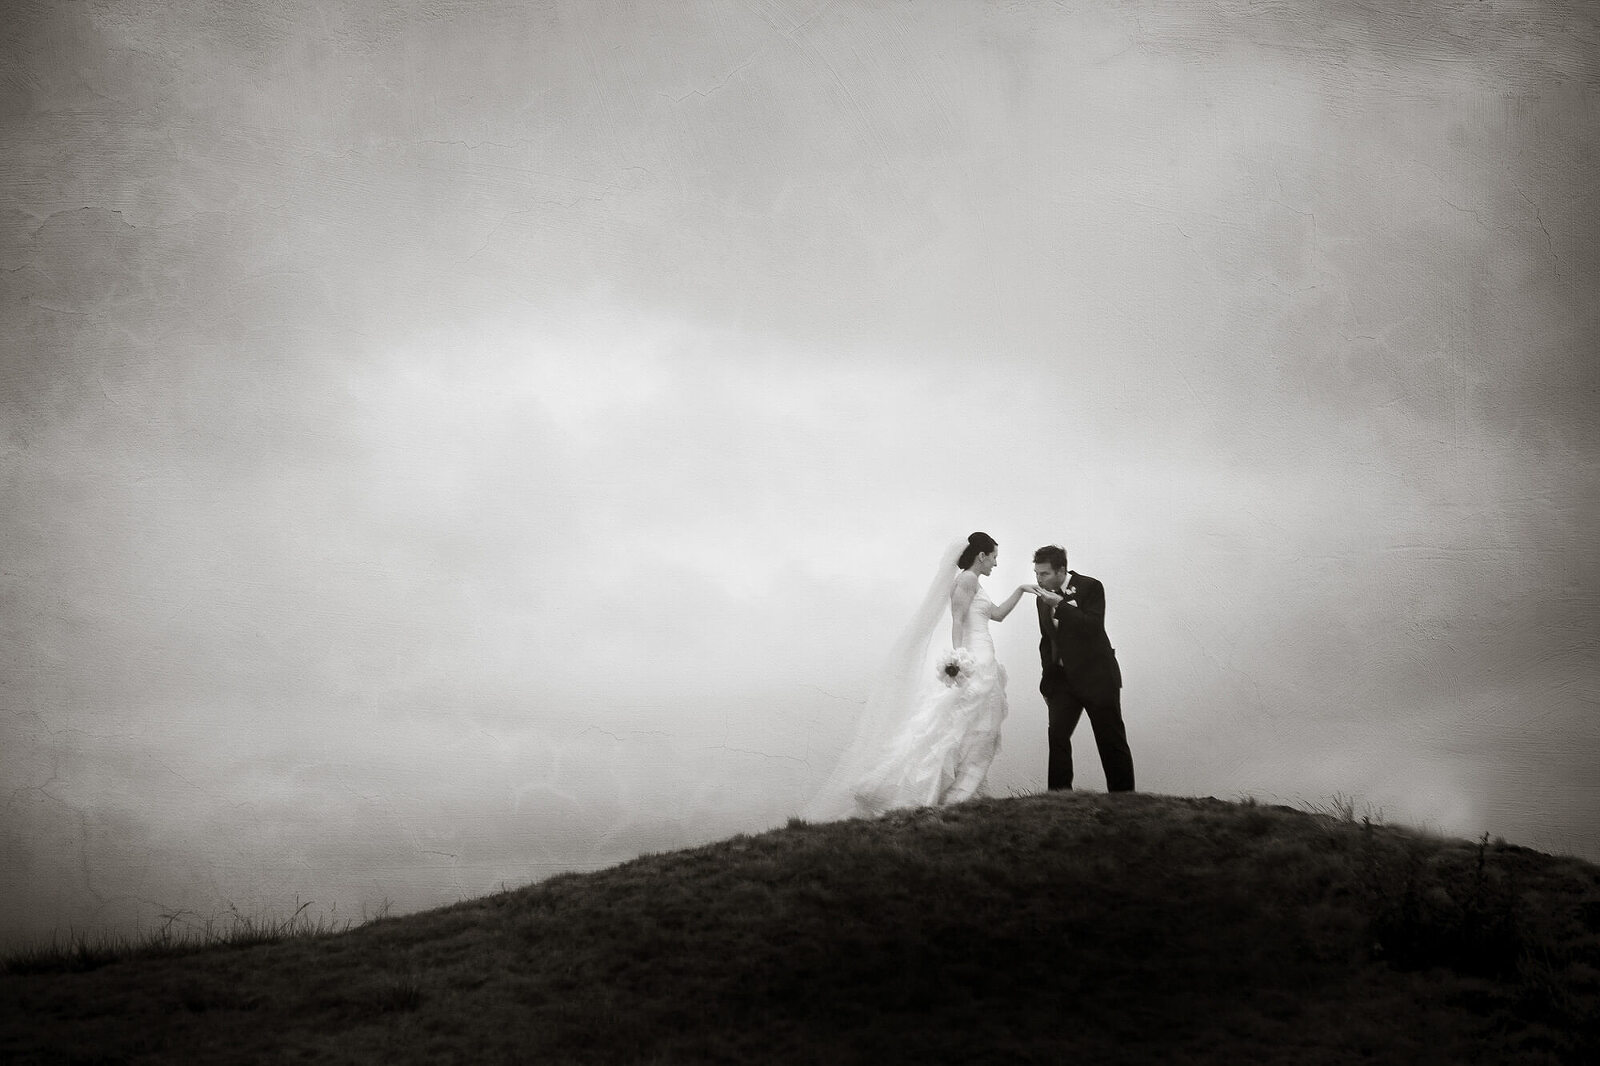 San Francisco wedding photographer - bride and groom portrait